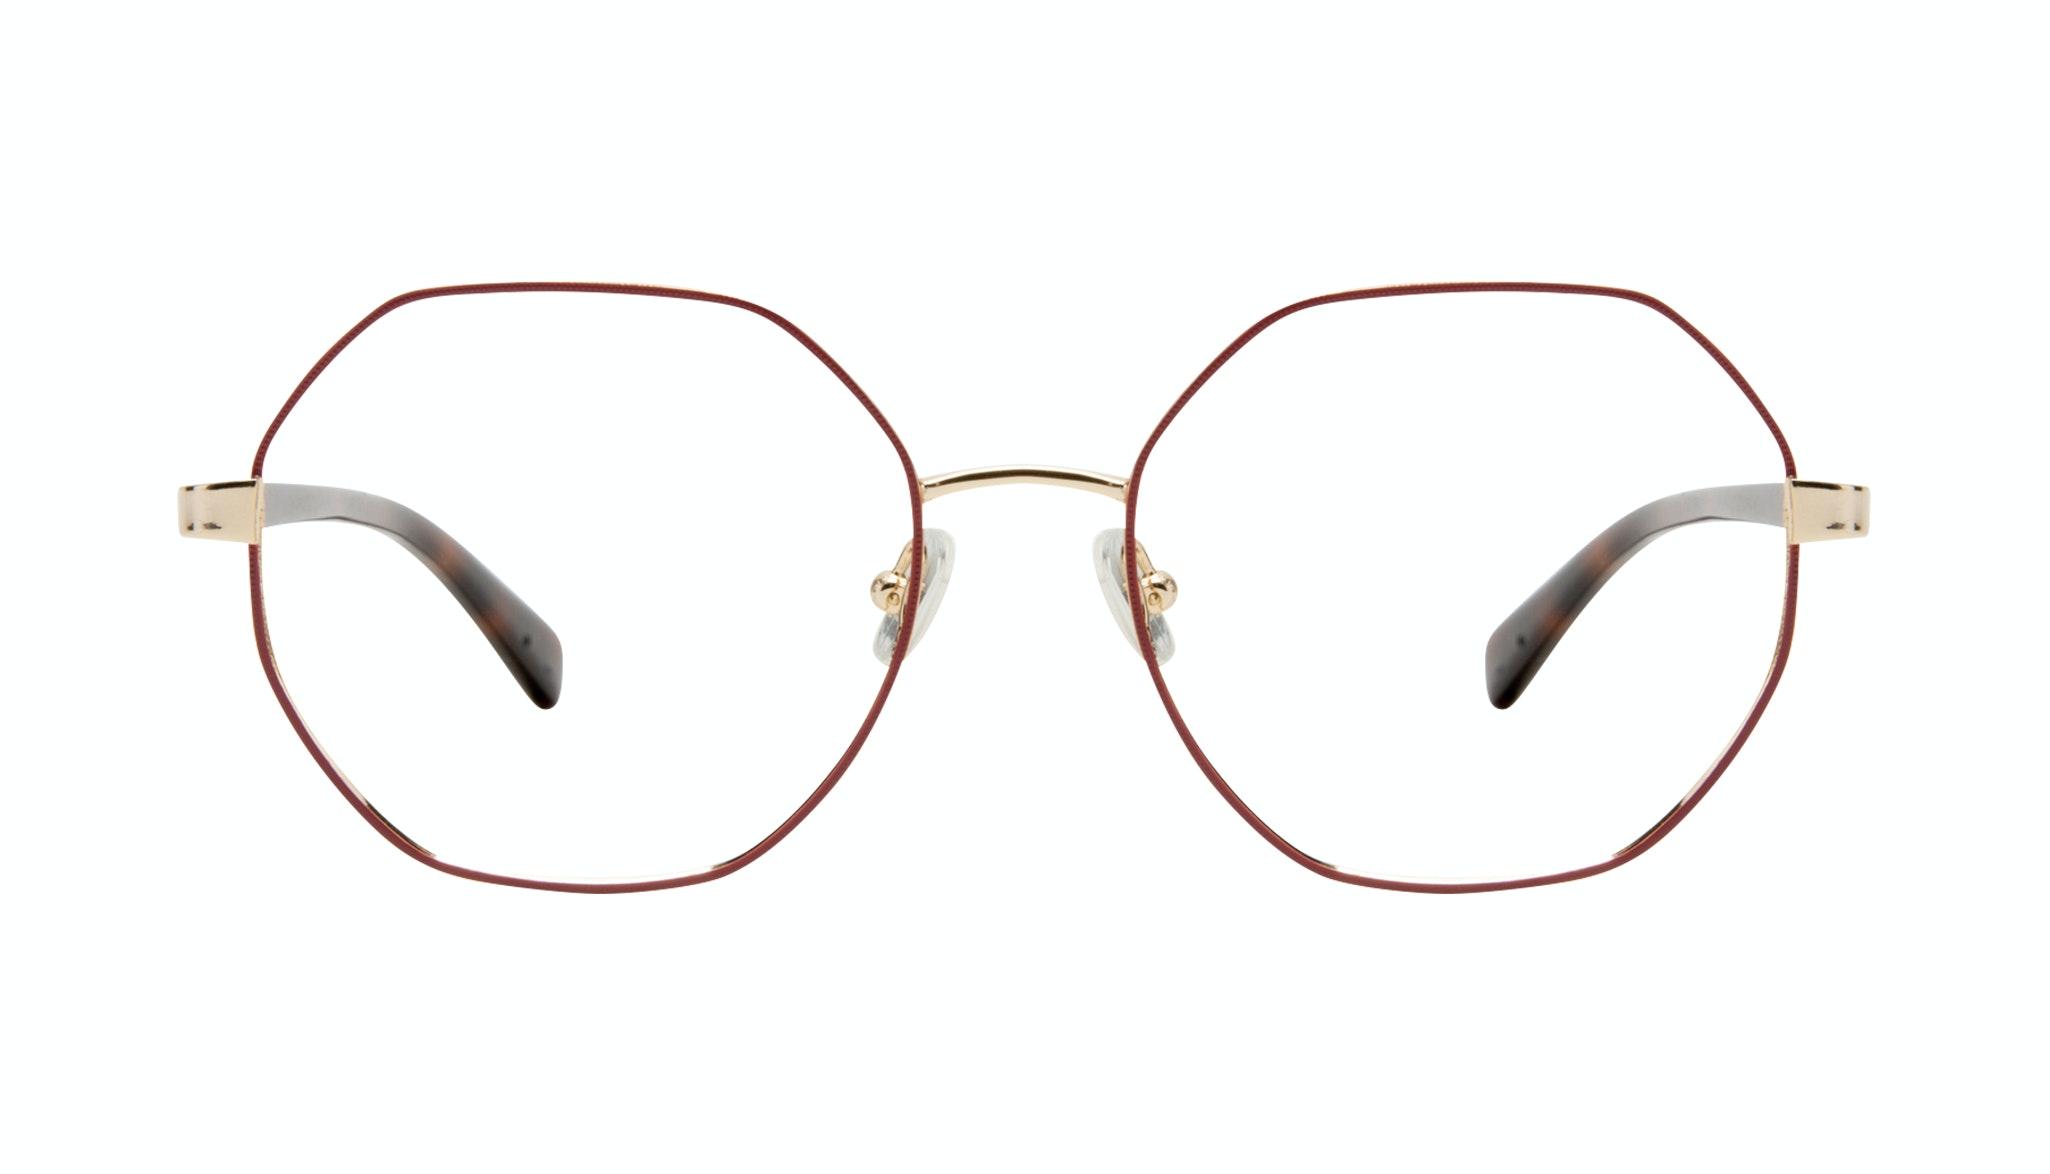 Affordable Fashion Glasses Round Eyeglasses Women Fantasy Wine Front